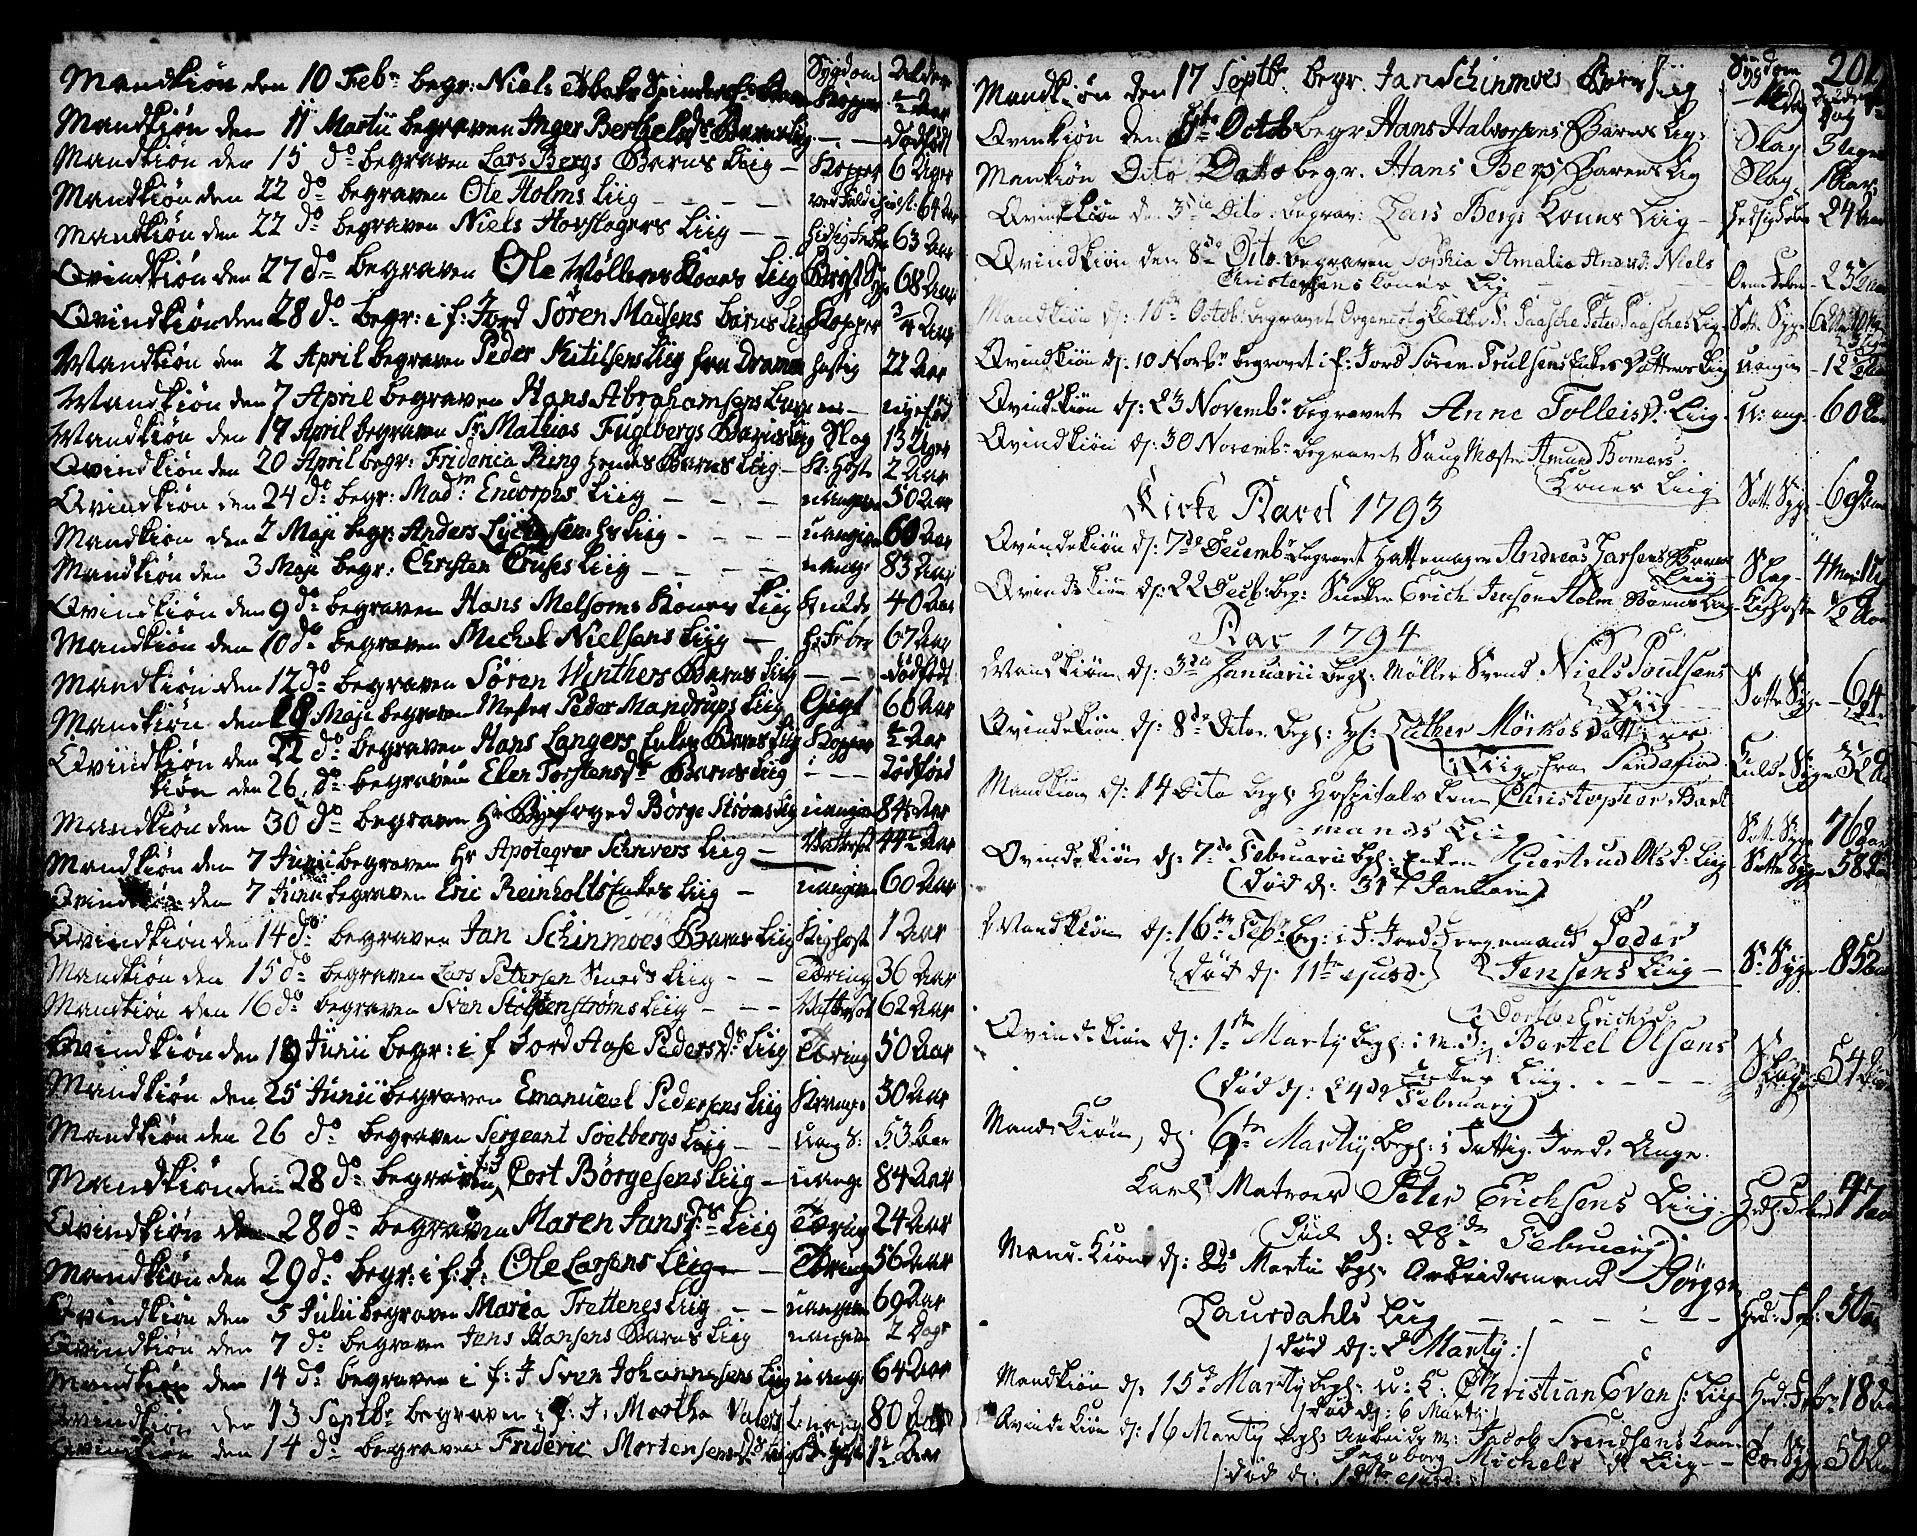 SAKO, Larvik kirkebøker, G/Ga/L0001: Klokkerbok nr. I 1, 1785-1807, s. 201